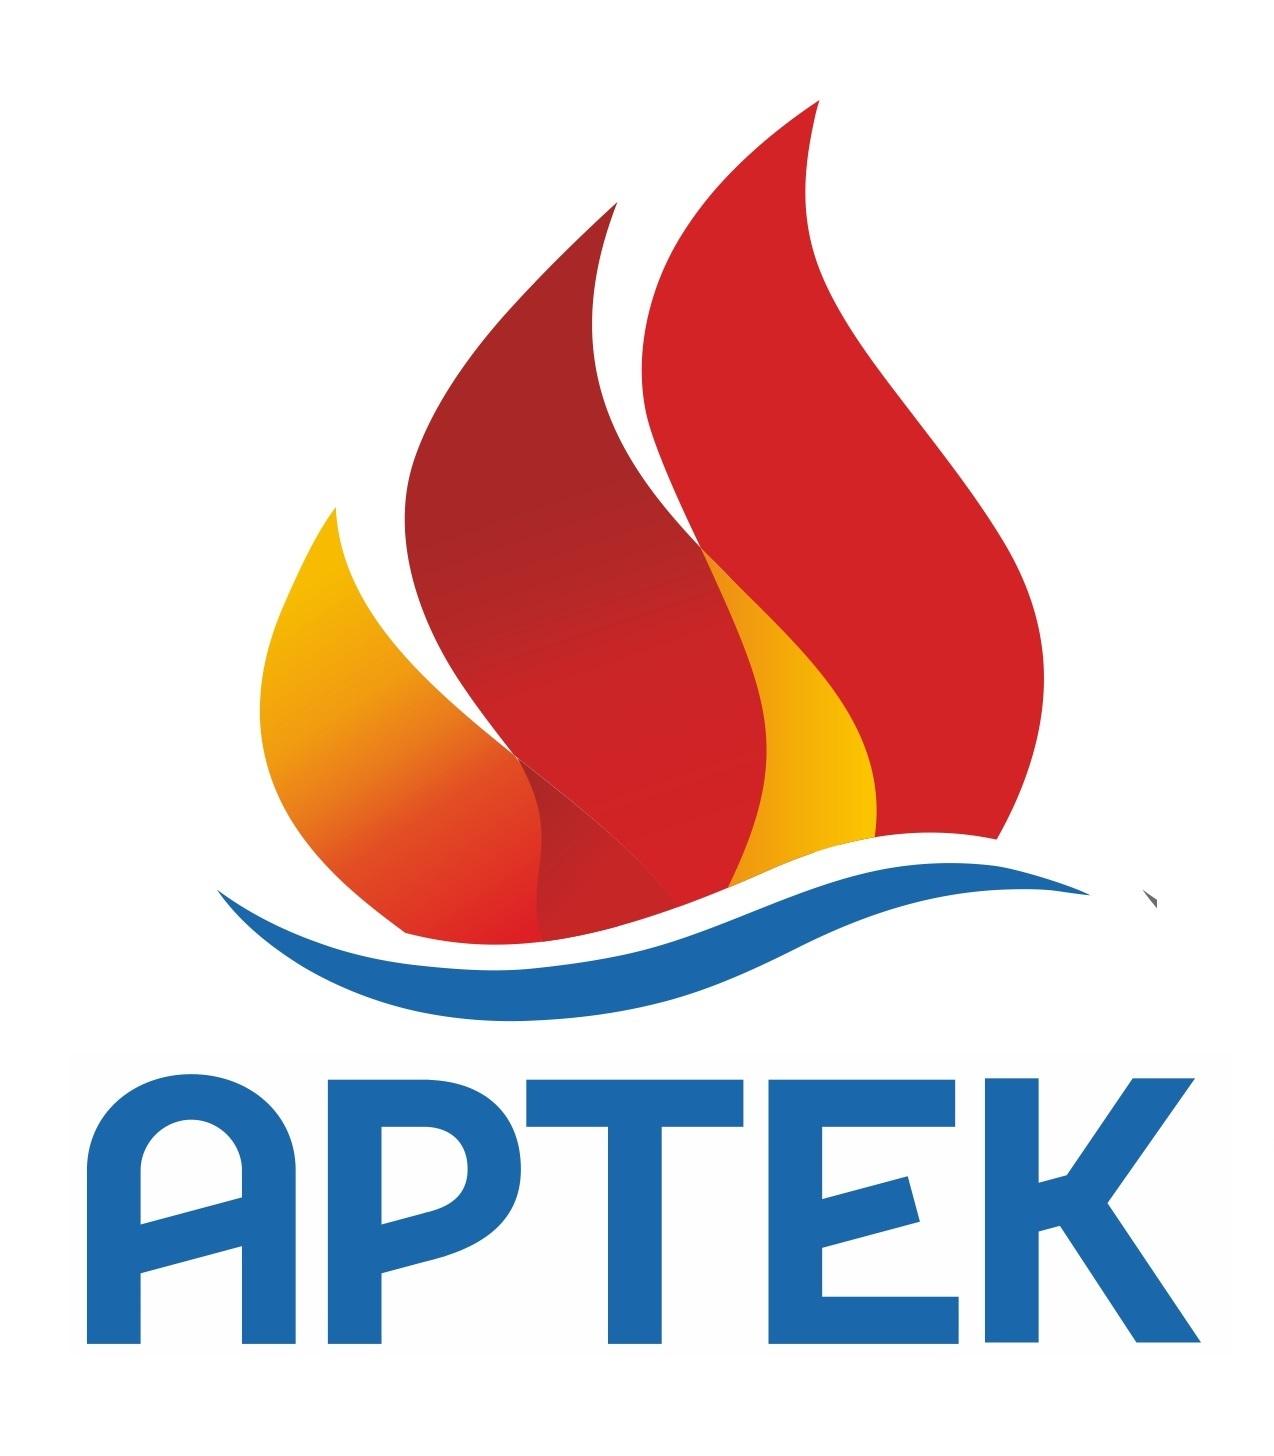 https://ugo-vostok63.ru/wp-content/uploads/2017/02/artek_logo.jpg